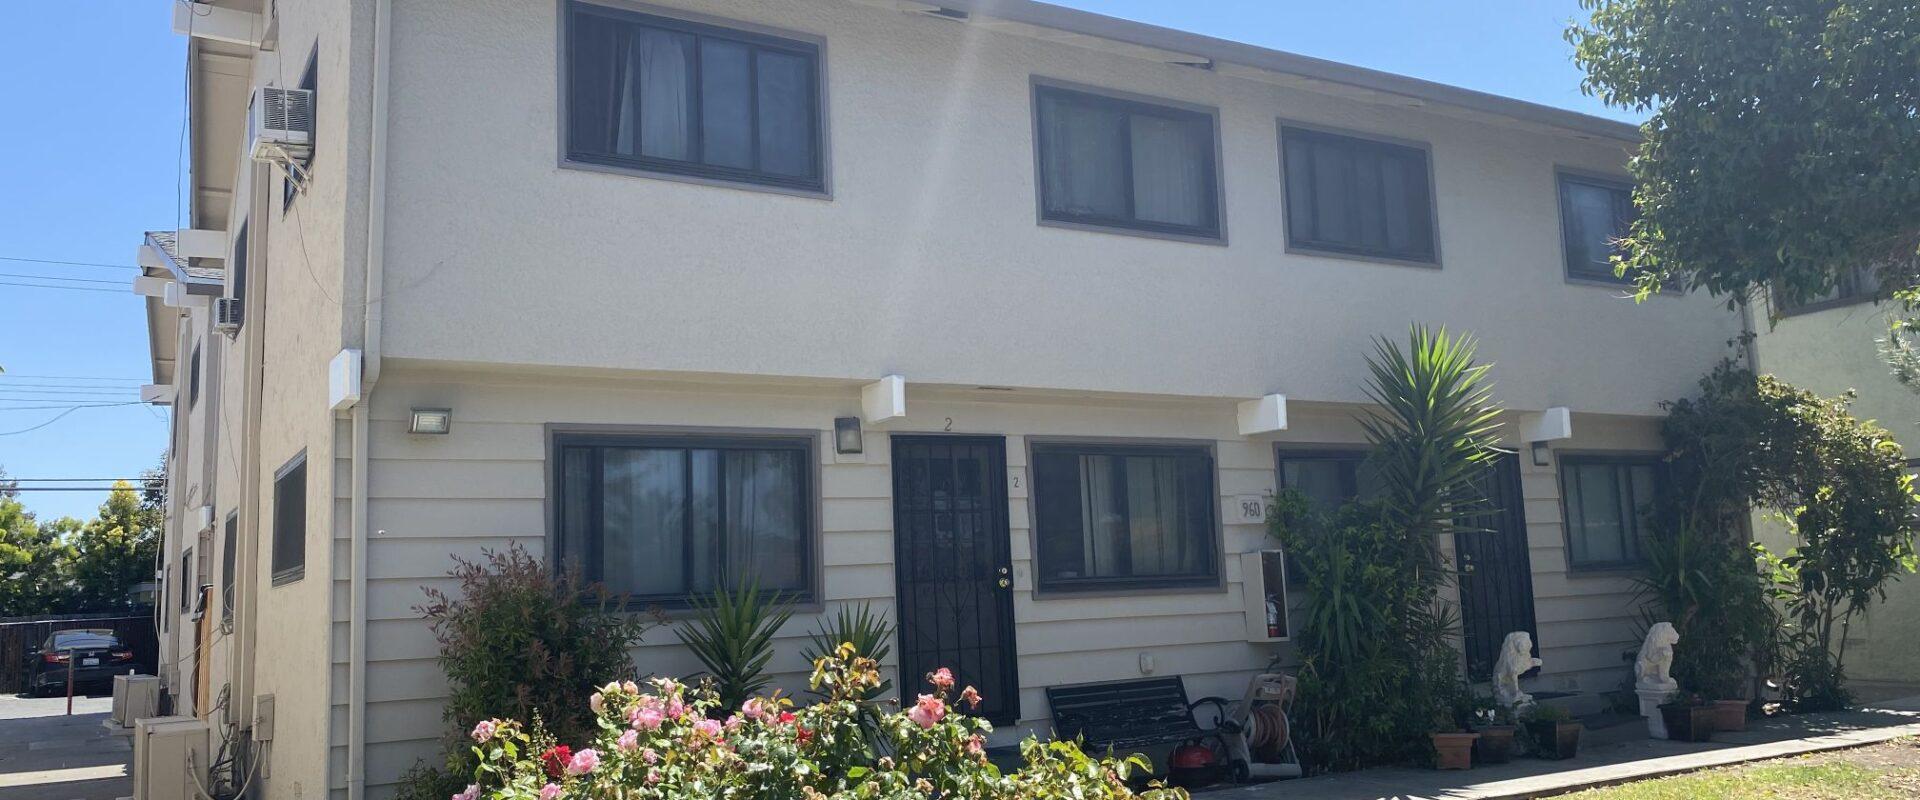 950 Clyde Ave, Santa Clara CA, 95054